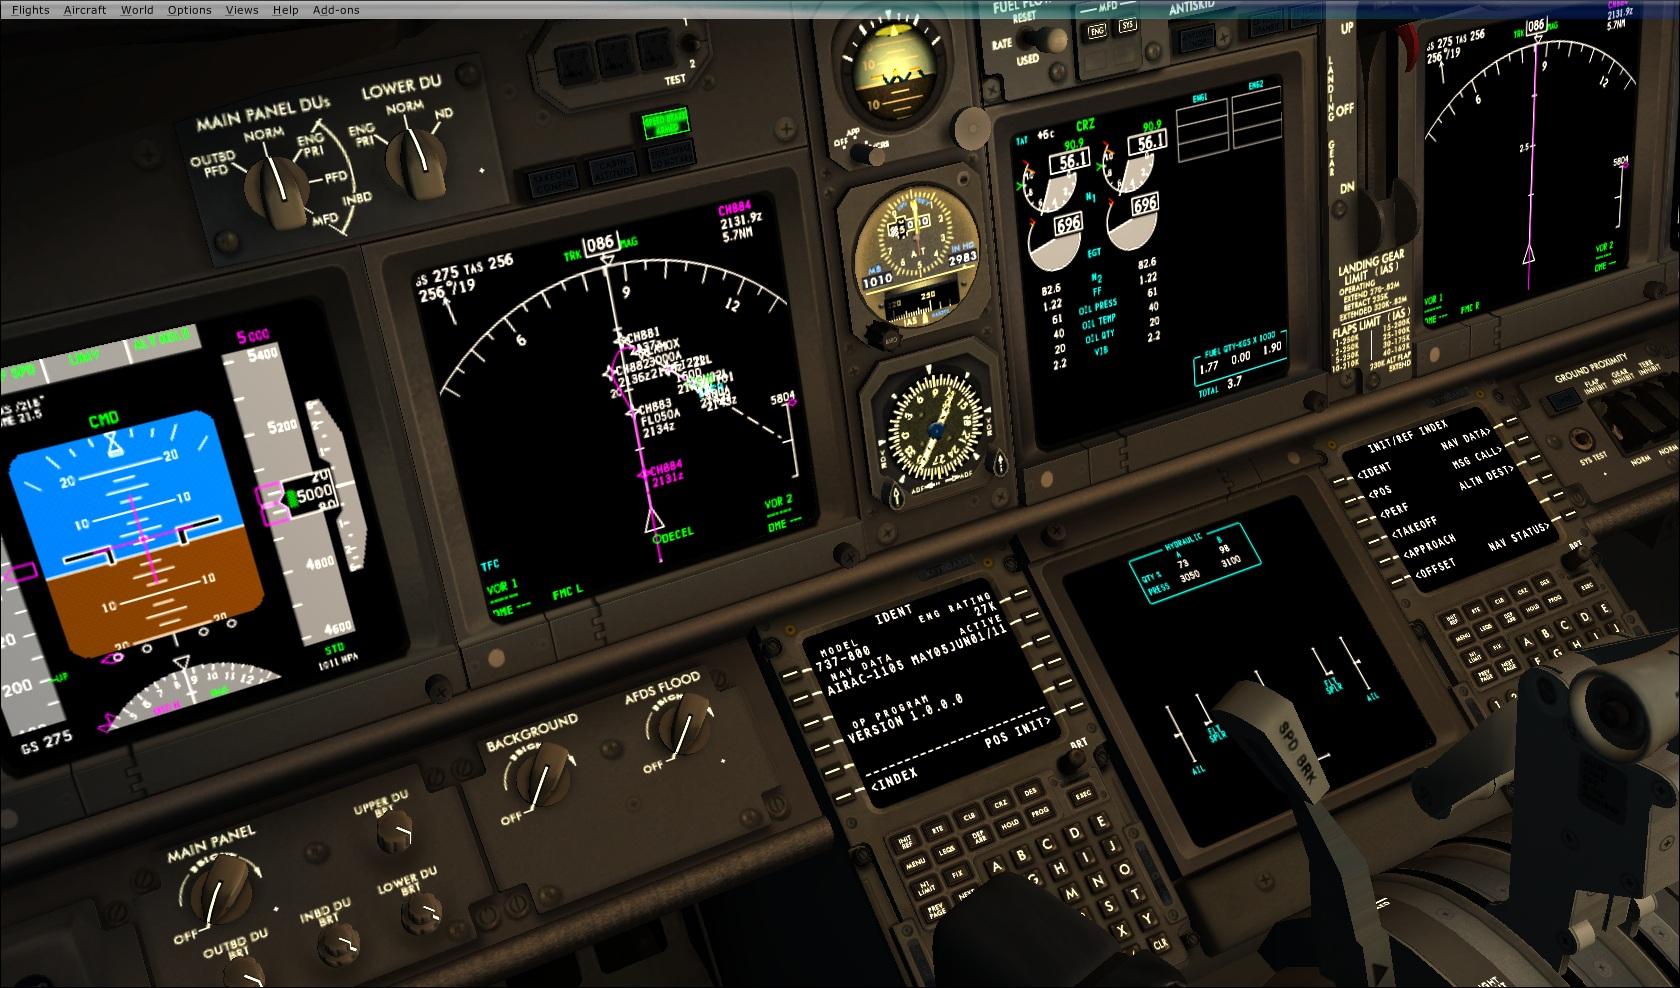 Ifly 737 Manual